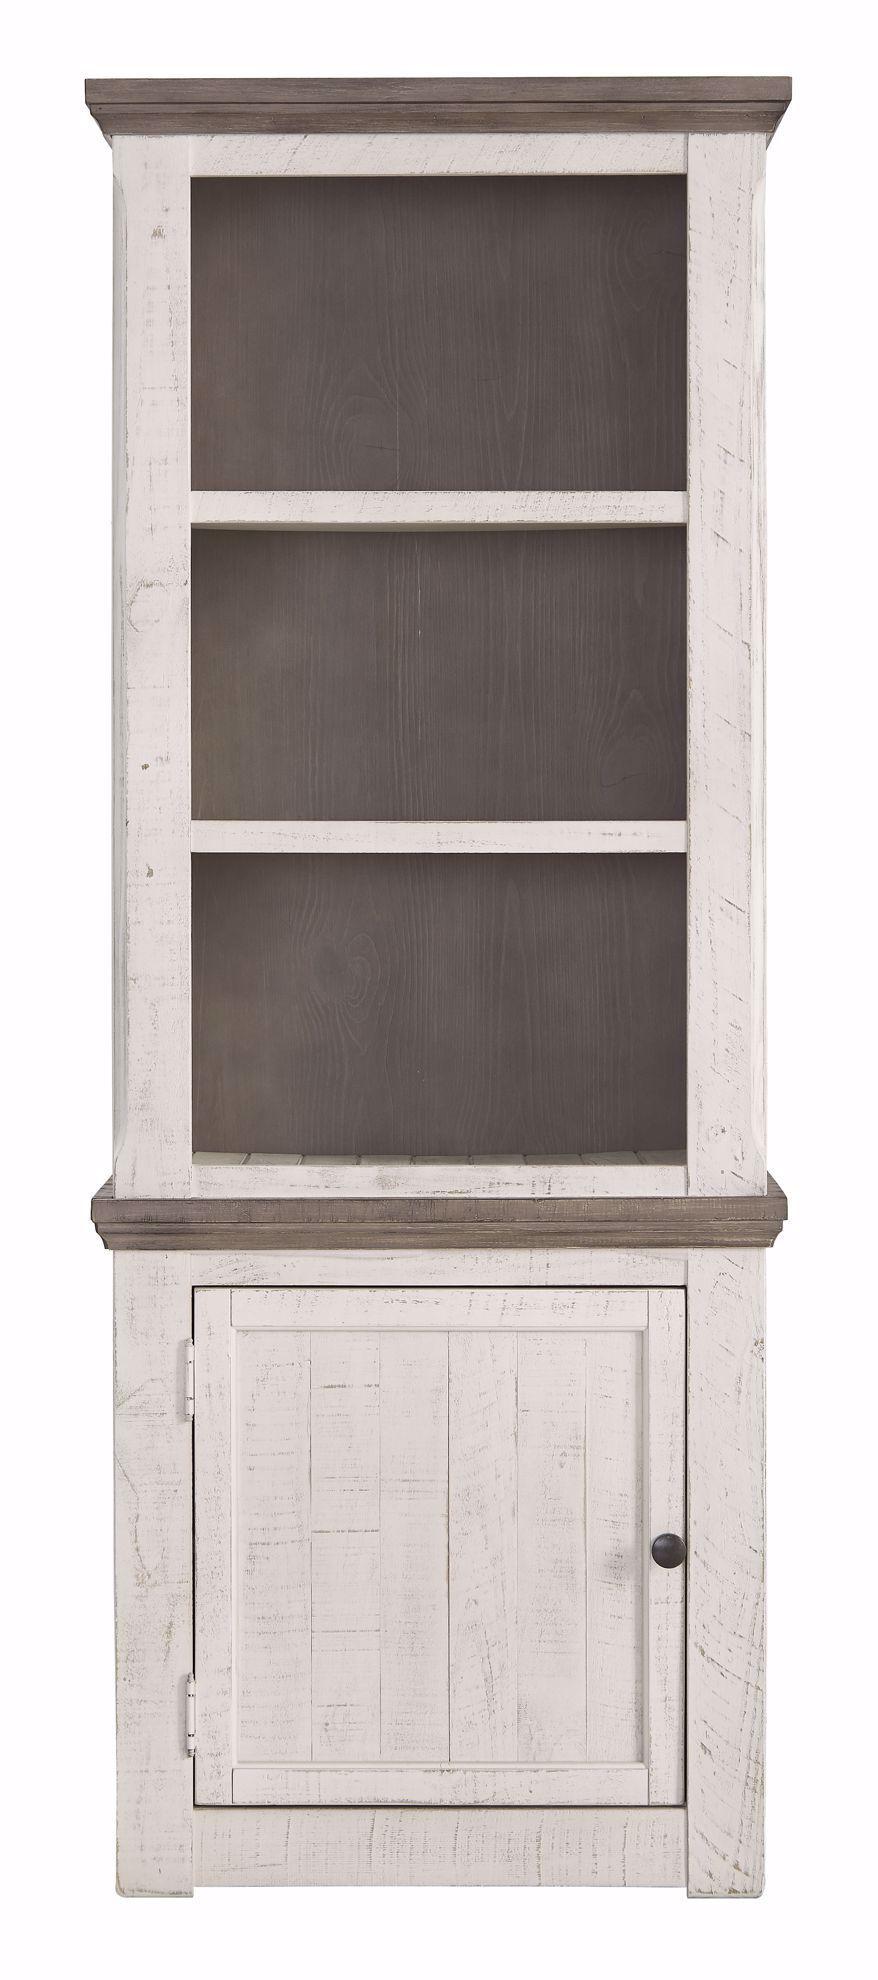 Picture of Havalance Left Pier Cabinet